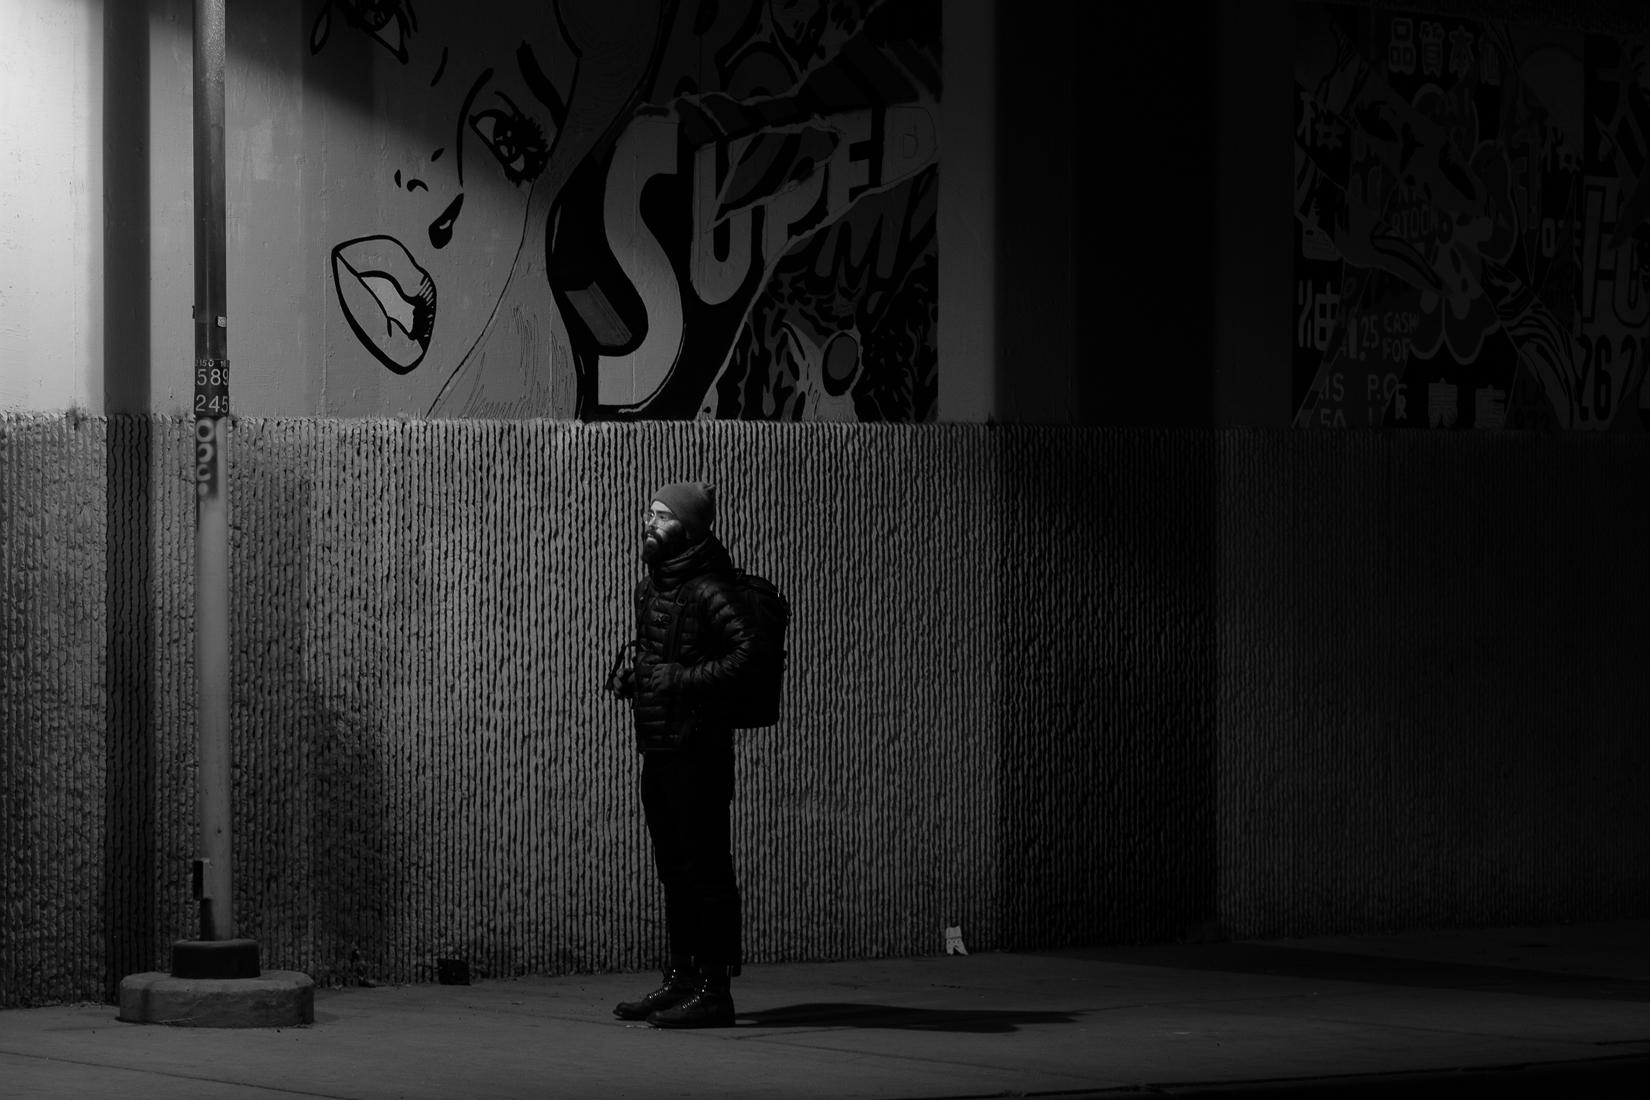 street-night-2.jpg